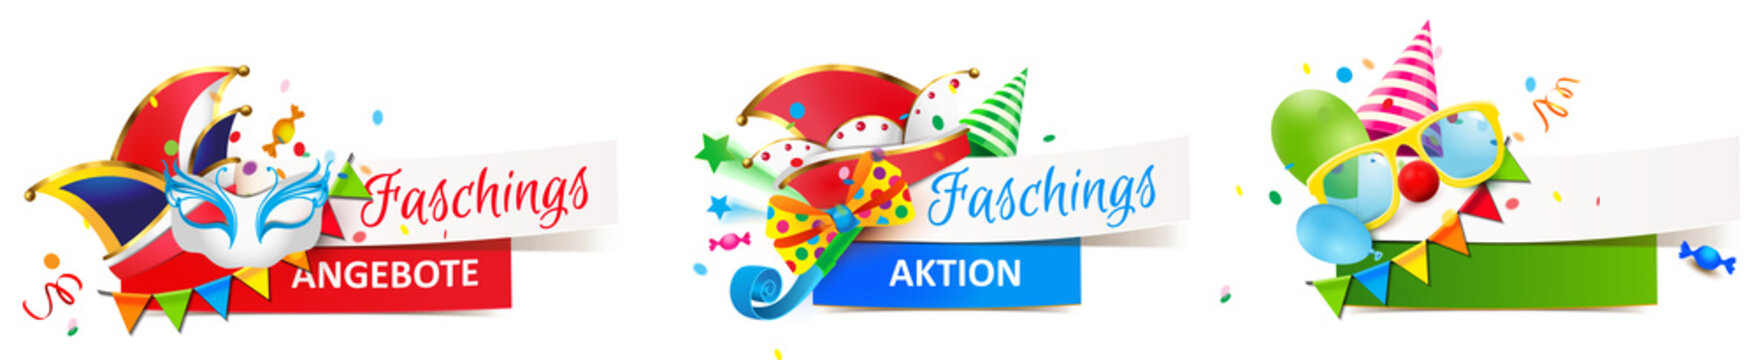 Banner Set mit Fasching Dekoration - Faschingsangebote, Faschingsaktion